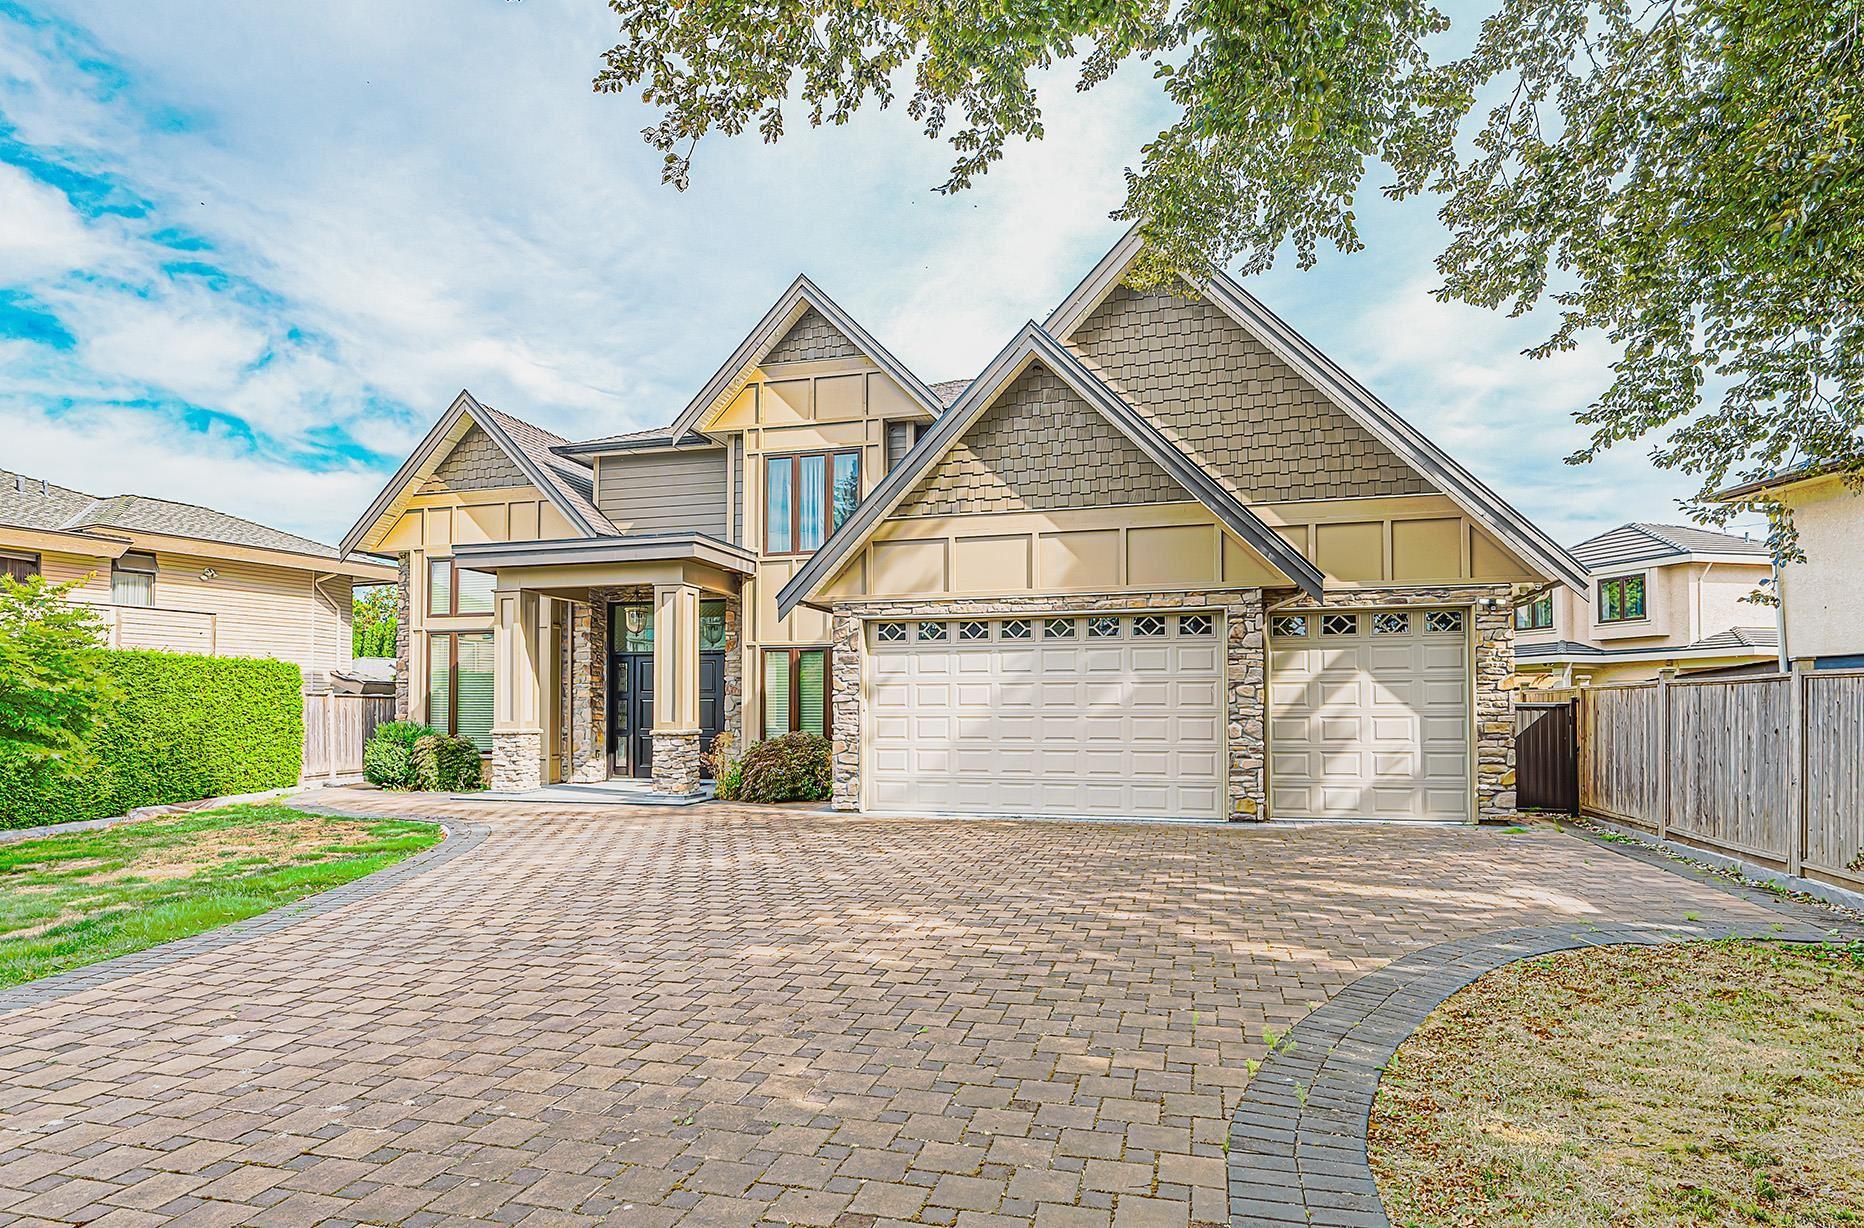 8700 CAMDEN CRESCENT - Lackner House/Single Family for sale, 5 Bedrooms (R2612474)